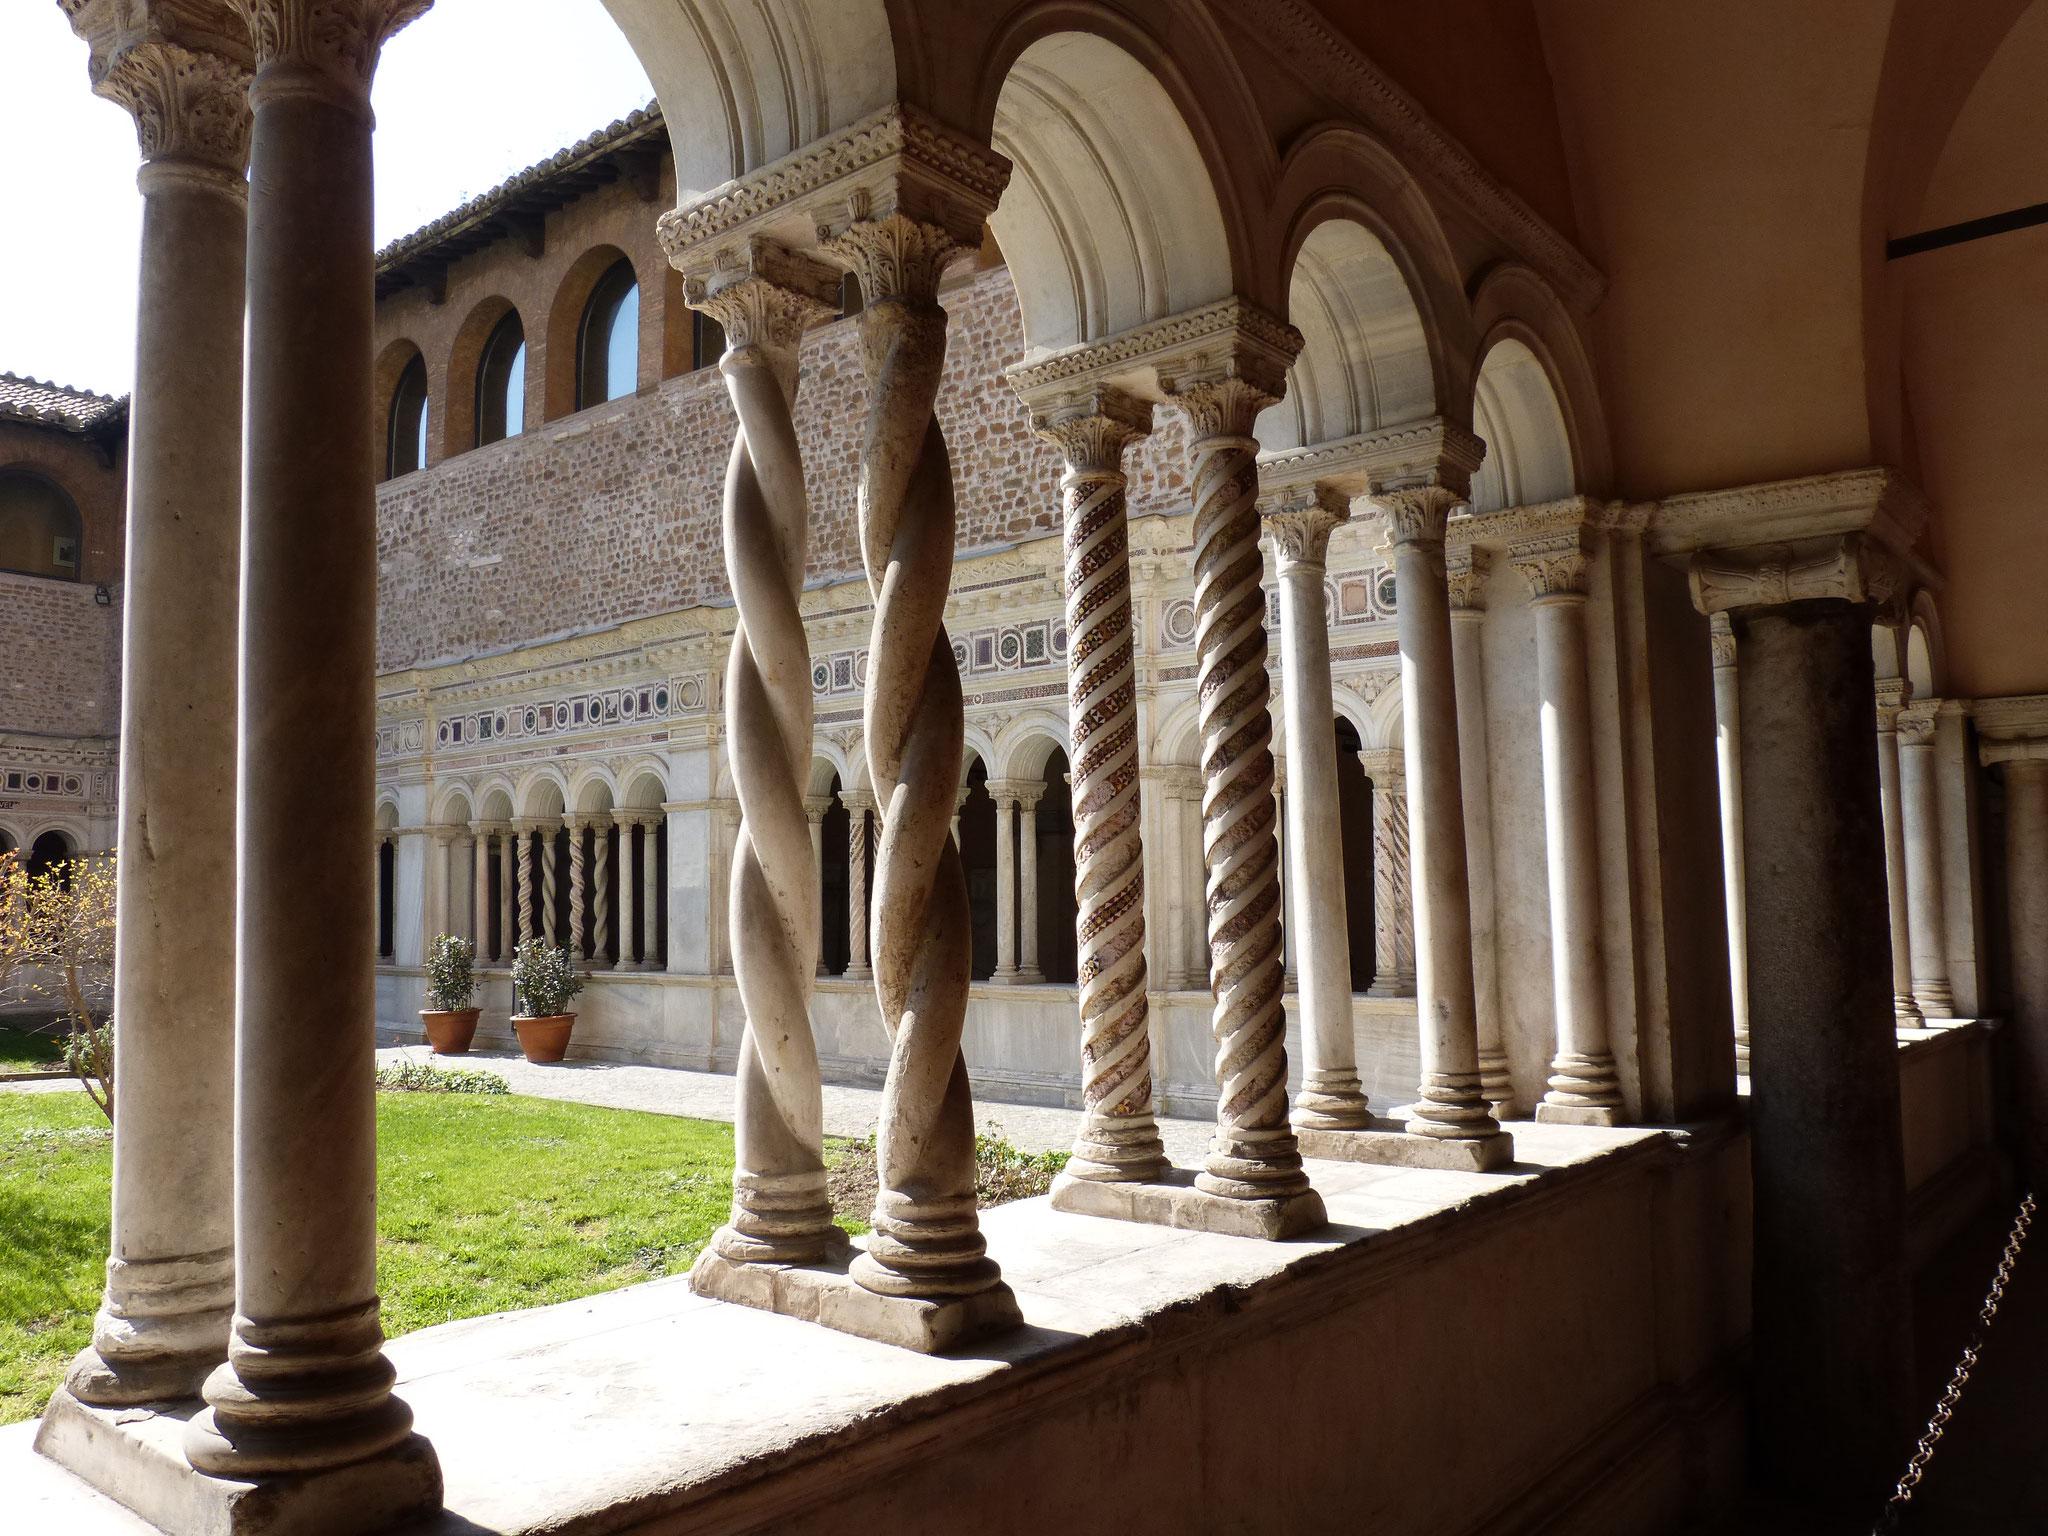 Der Kreuzgang der Basilika San Giovanni Laterano.